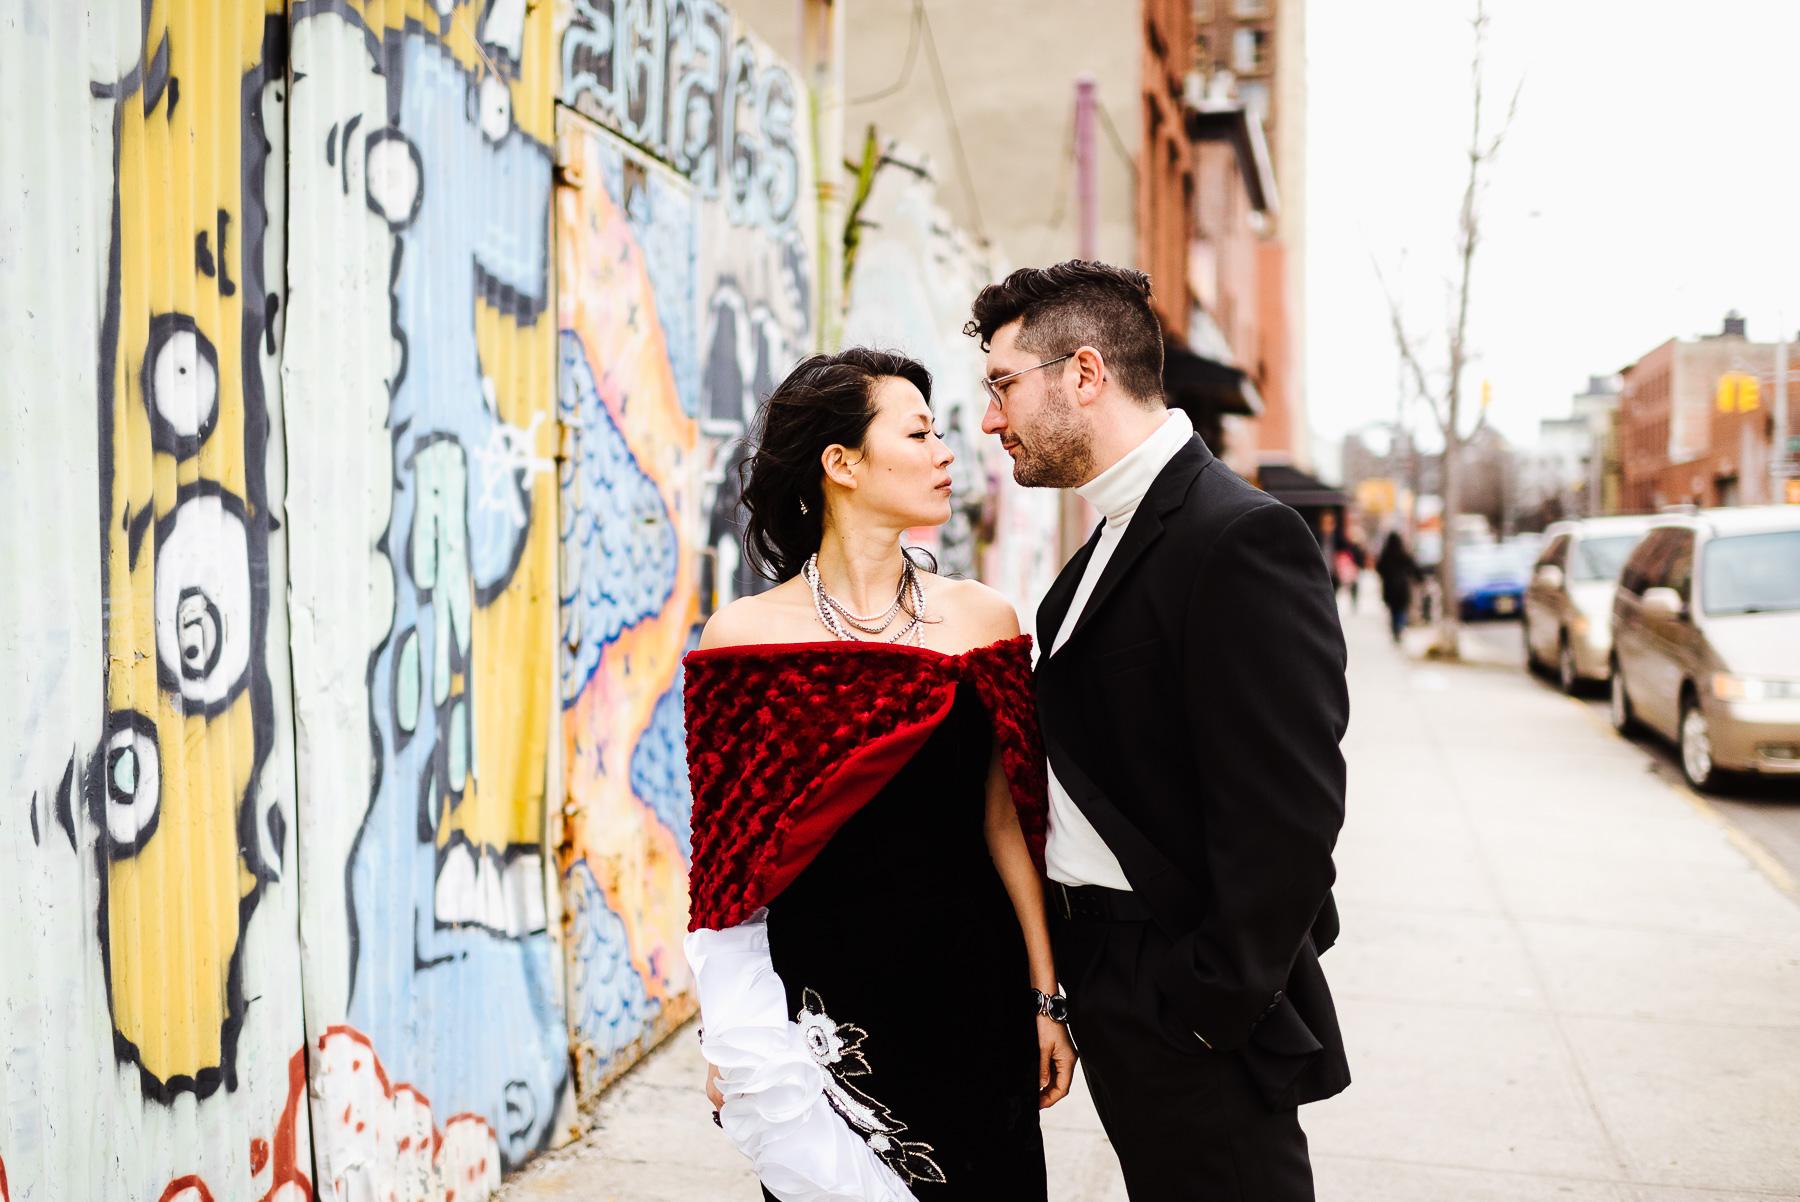 72-Williamsburg Brooklyn Wedding Photographer Brooklyn Engagement Photos NYC Weddings Brooklyn Weddings Longbrook Photography.jpg